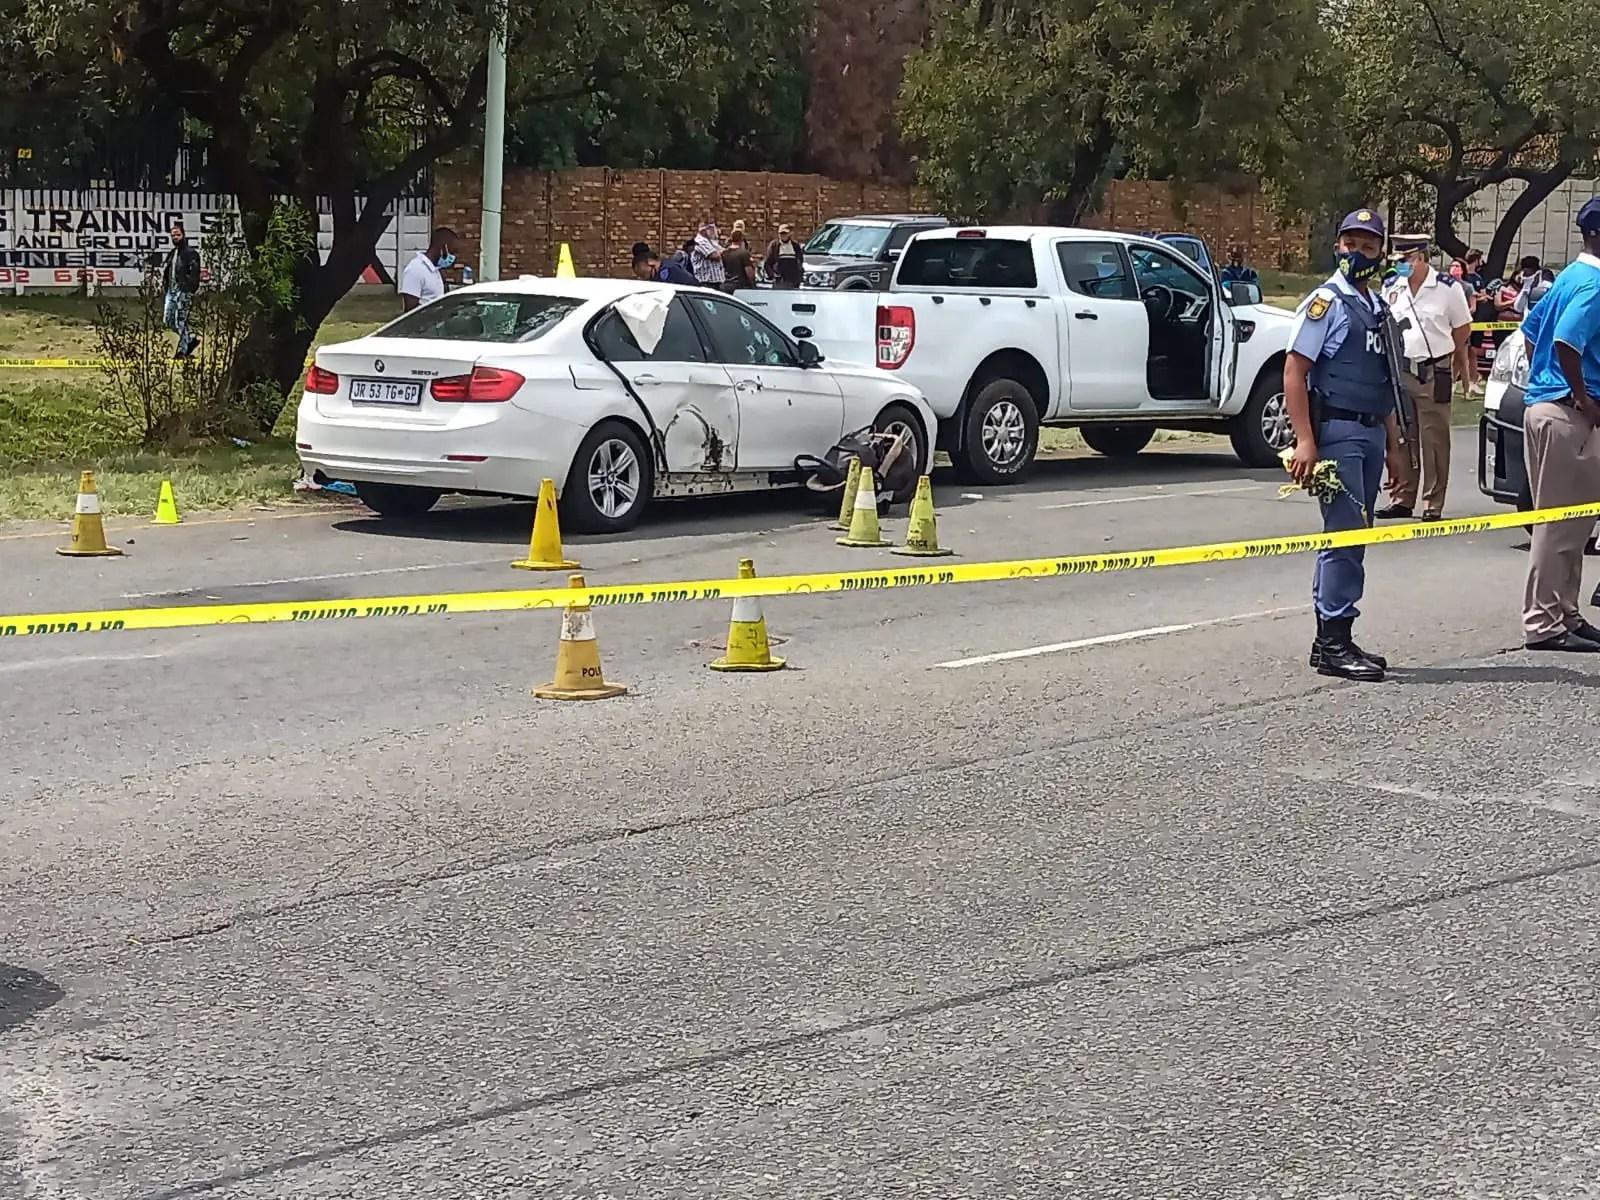 Former Western Cape gang leader Ernie 'Lastig' Solomon killed in Boksburg |  News365.co.za